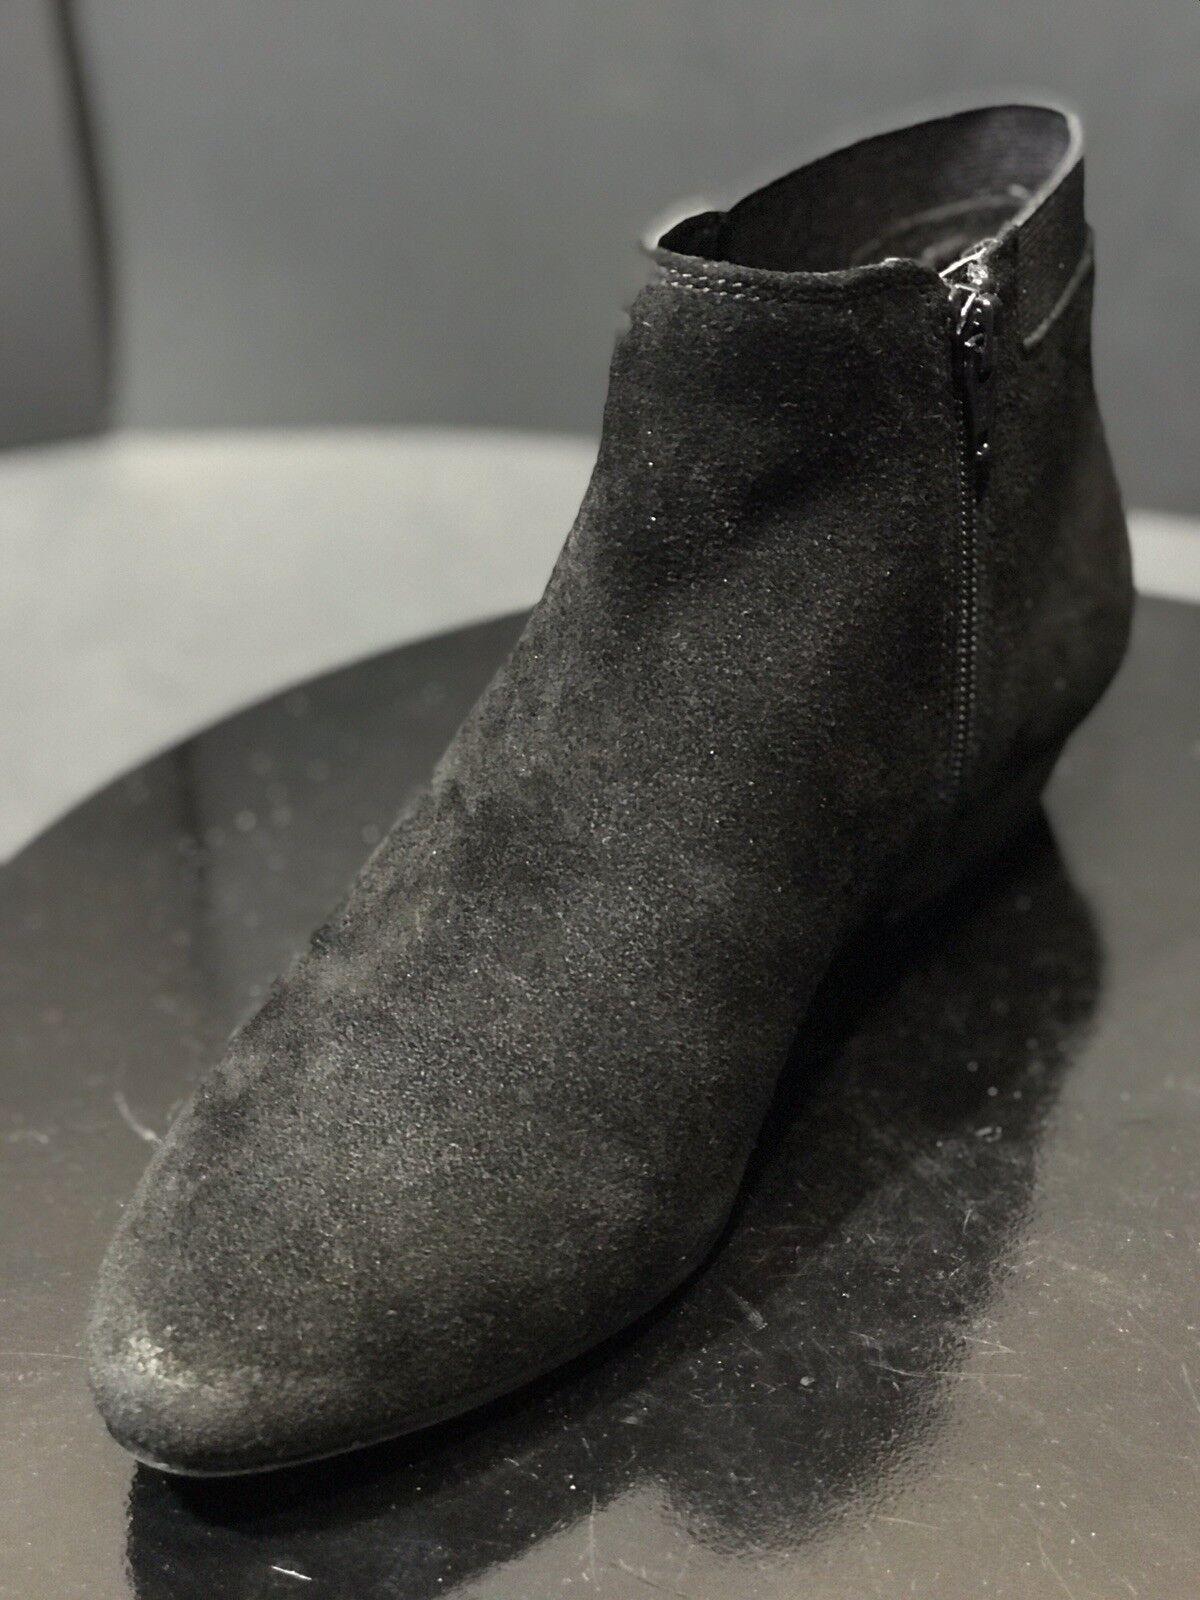 Aldo Simán Gamuza Negra Cremallera Lateral Botines De Mujer Talla 8.5 M EE. UU.